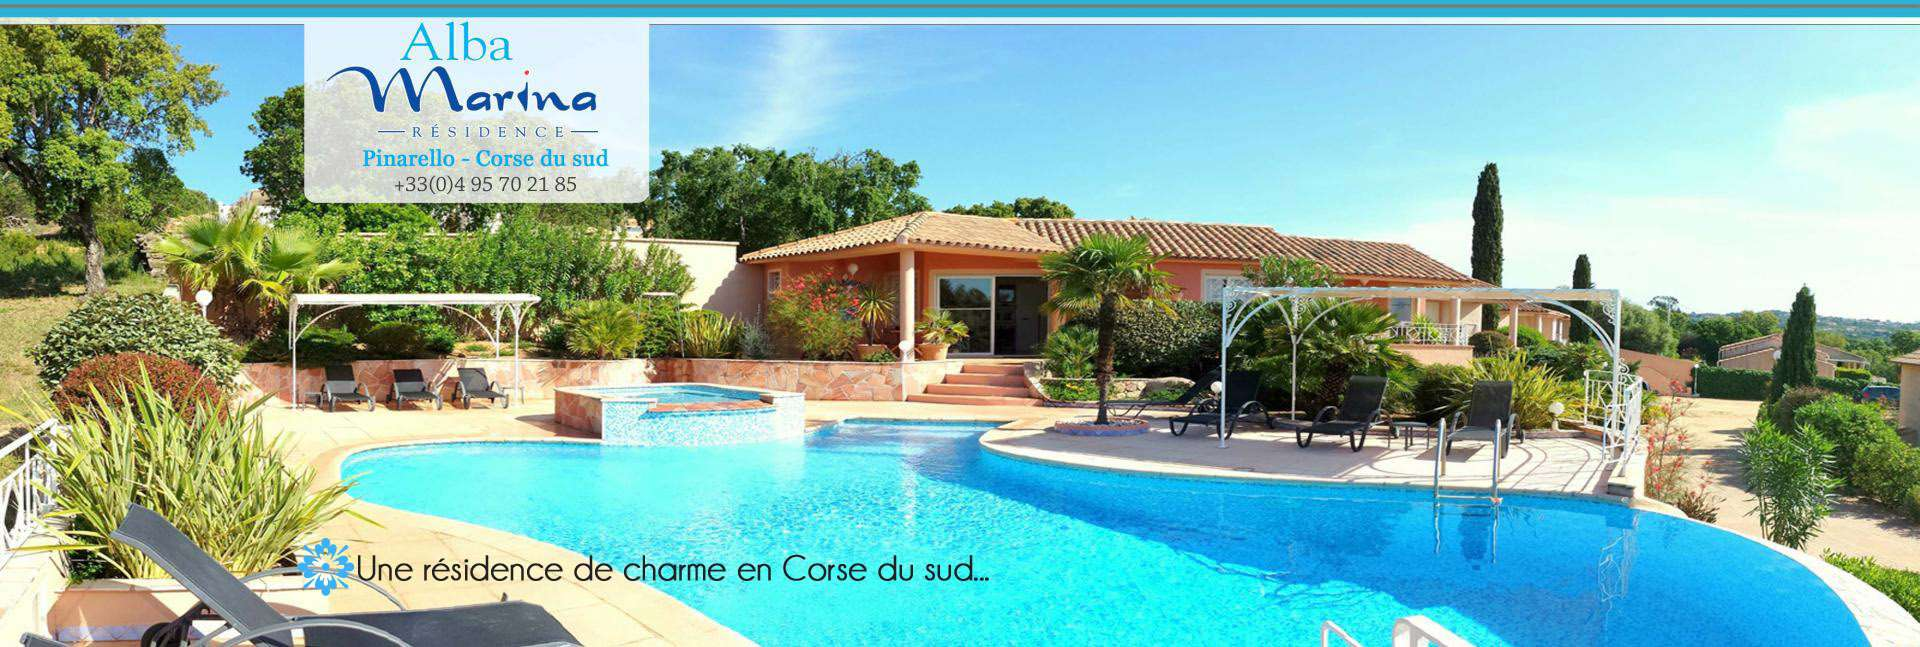 Location porto vecchio villa en corse du sud for Villa avec piscine en corse